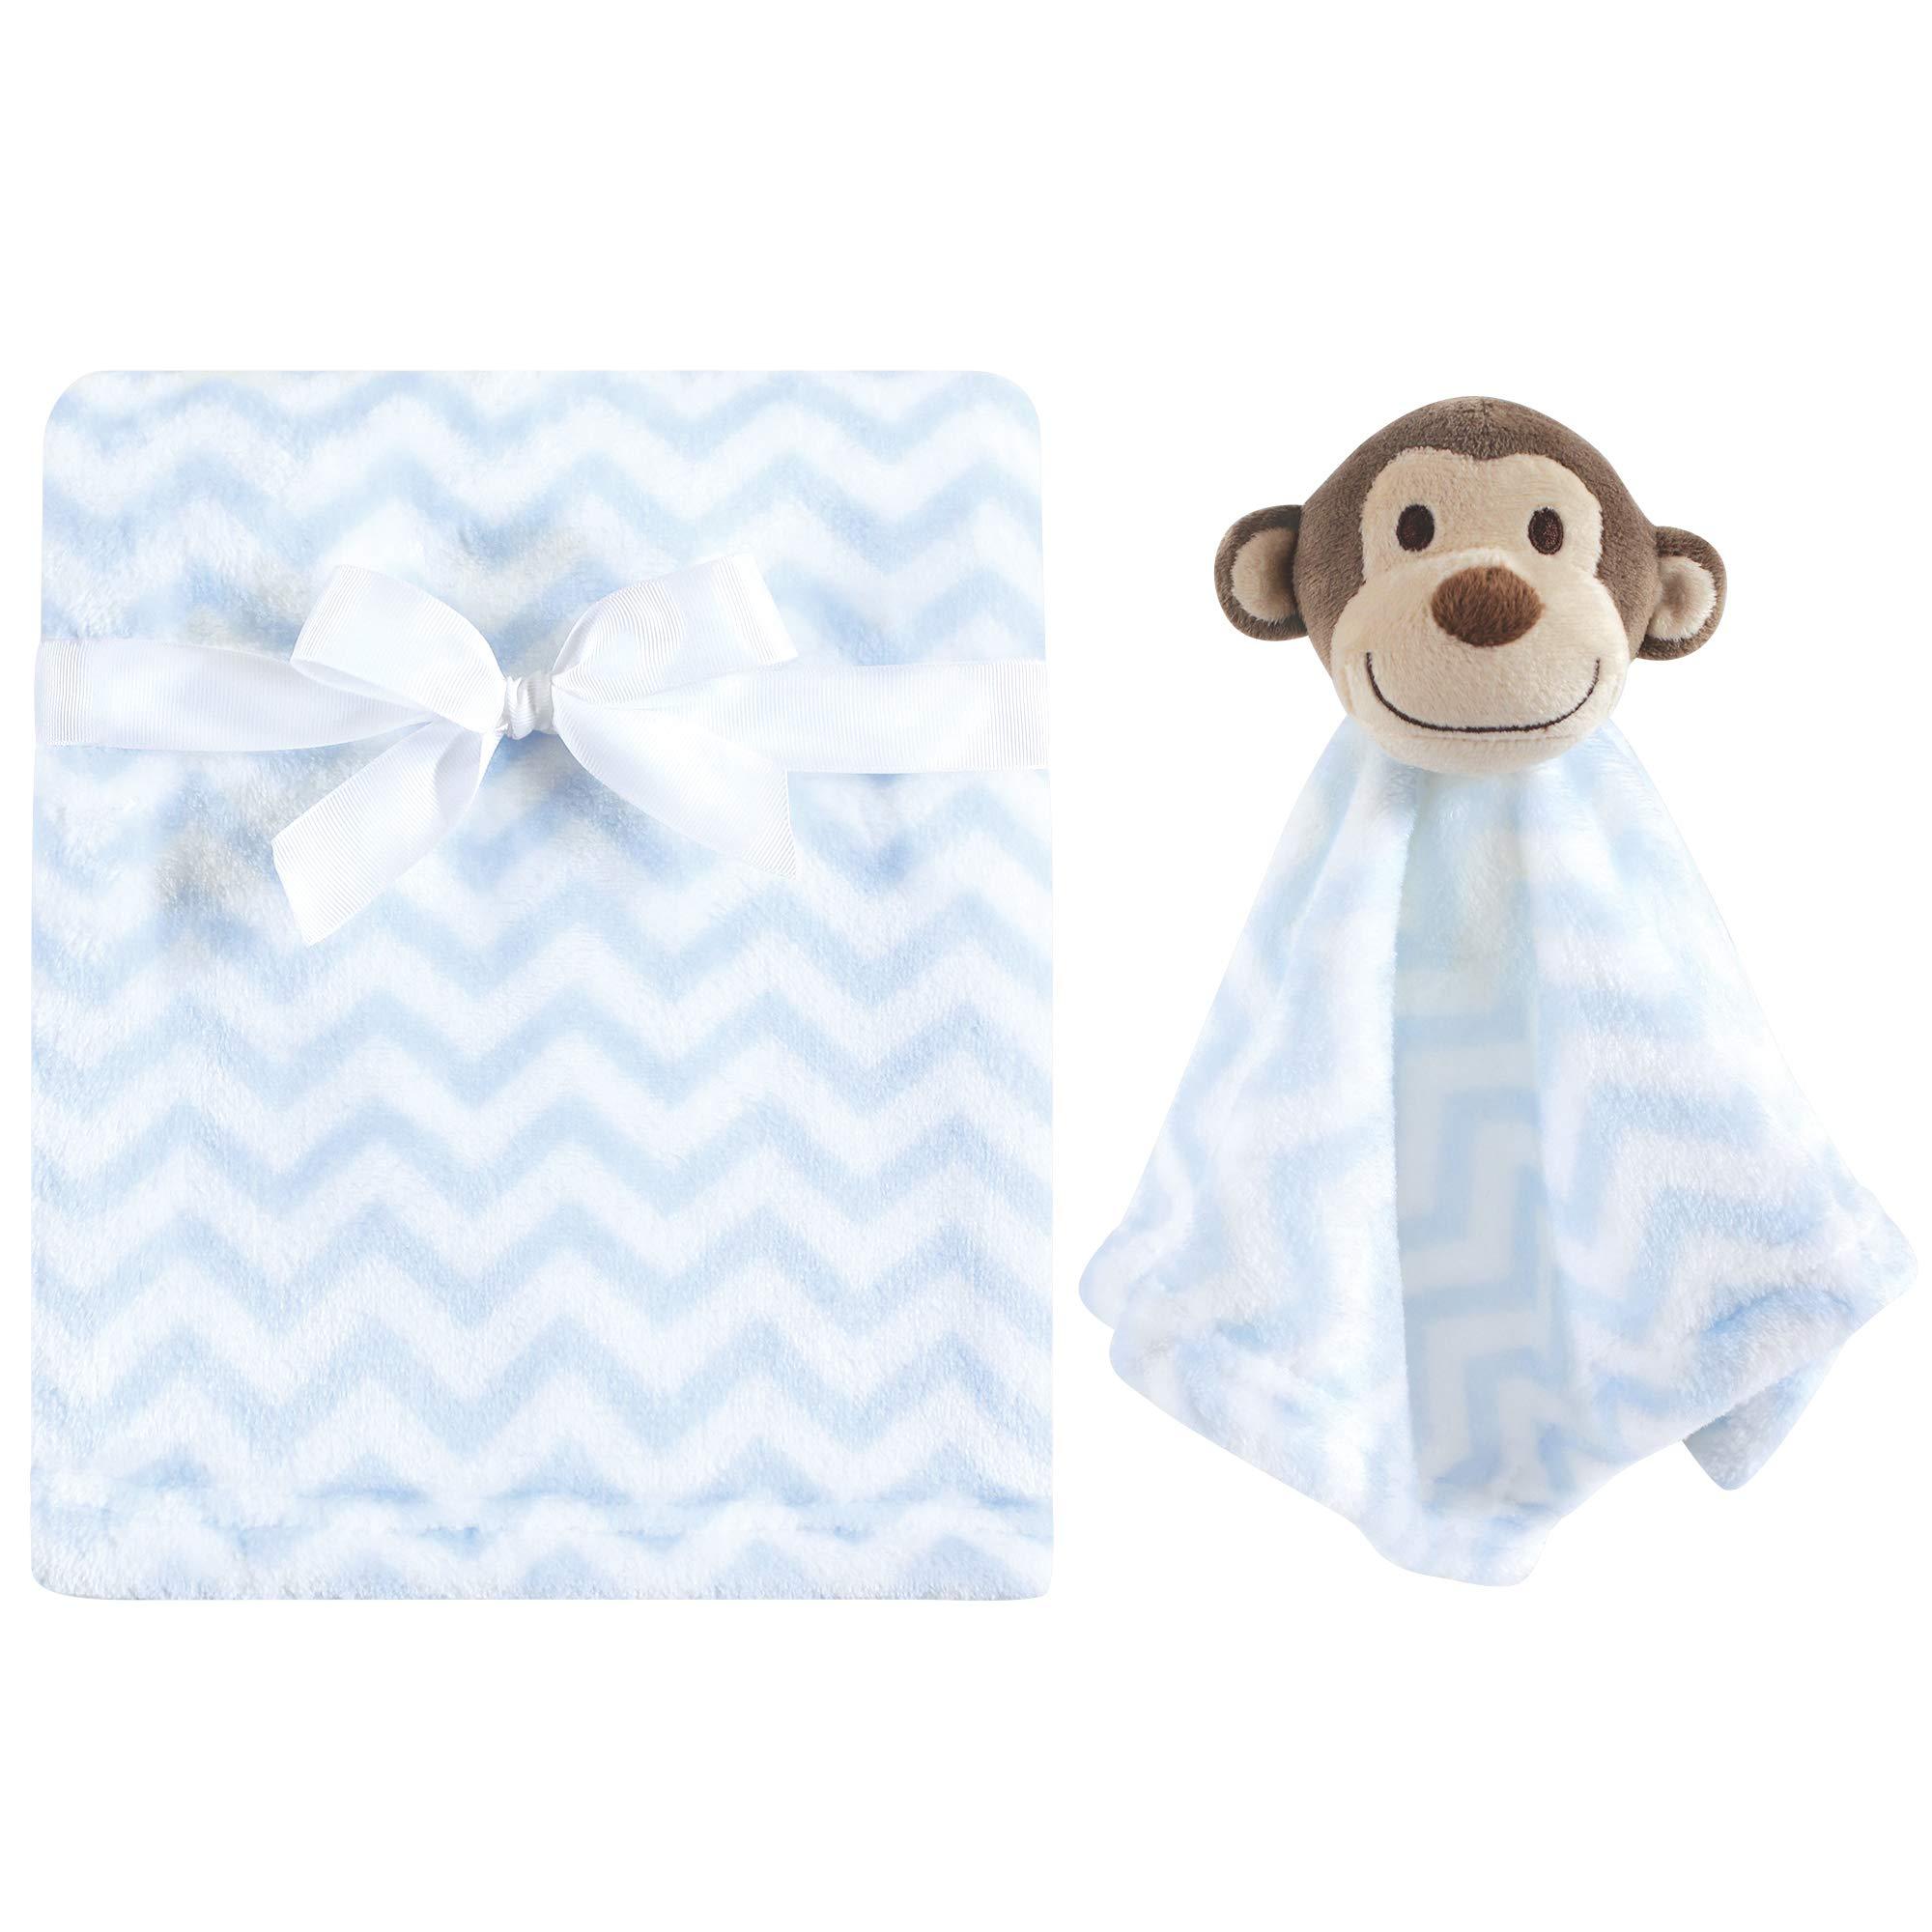 7428e74ec99c Amazon.com  Hudson Baby Plush Security Blanket Set